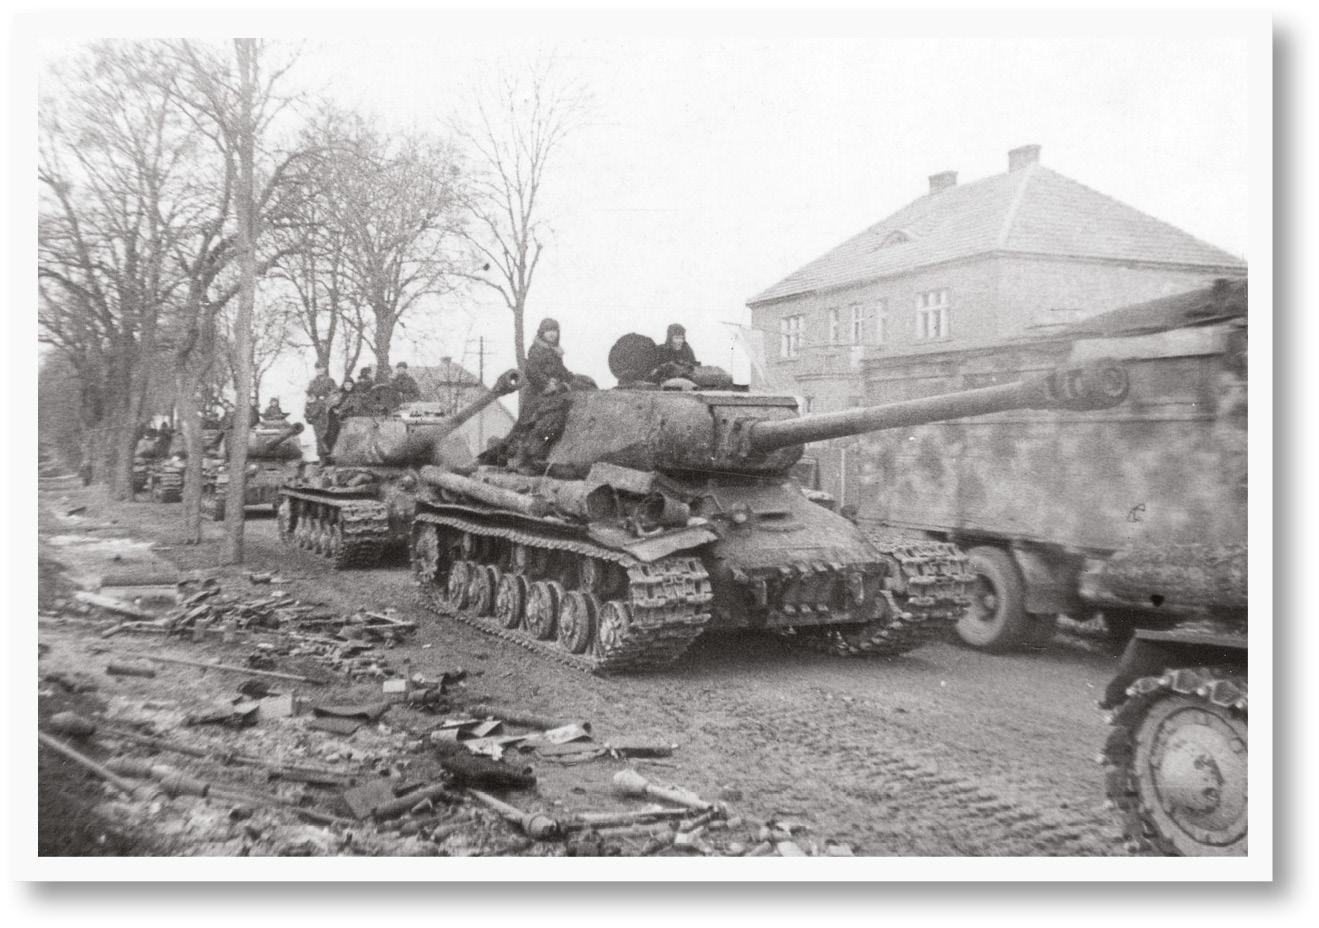 Soviet armour. The T-34 medium main battle tank [below], the Joseph Stalin Mark II heavy tank [left], and the KV-85 heavy tank [bottom left].